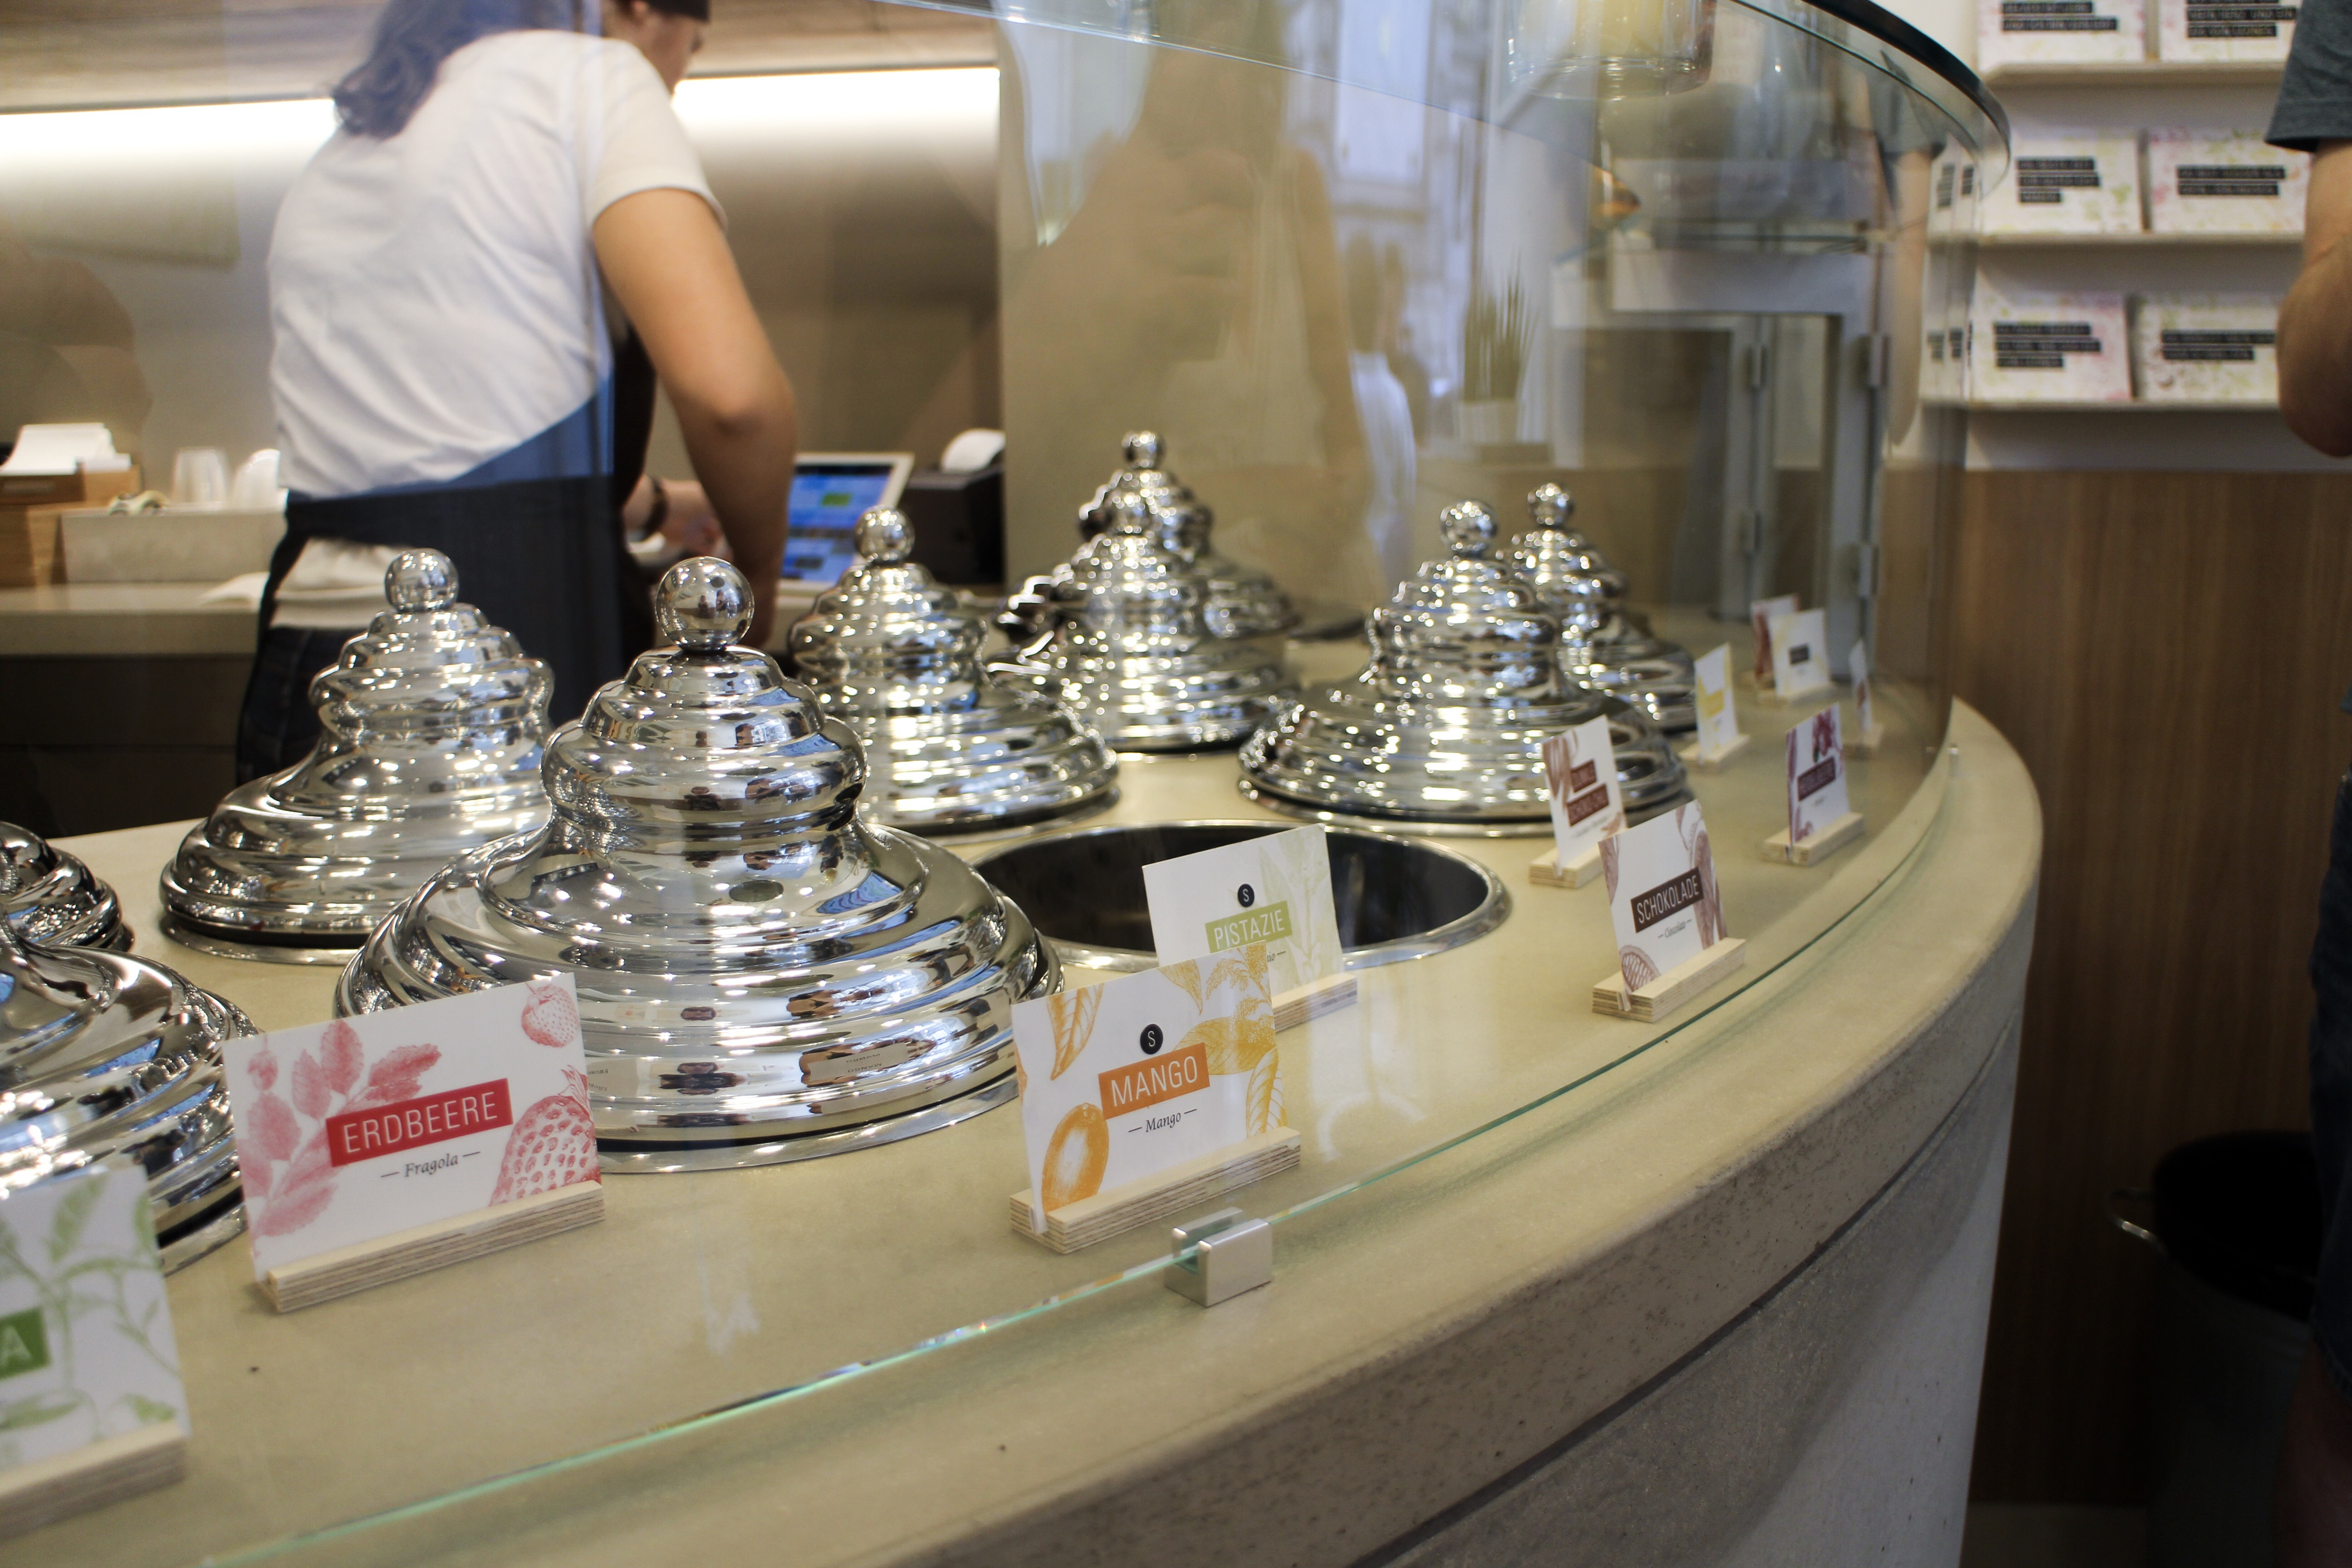 Three Perfect Days in Vienna: Ice cream at Leones Gelato